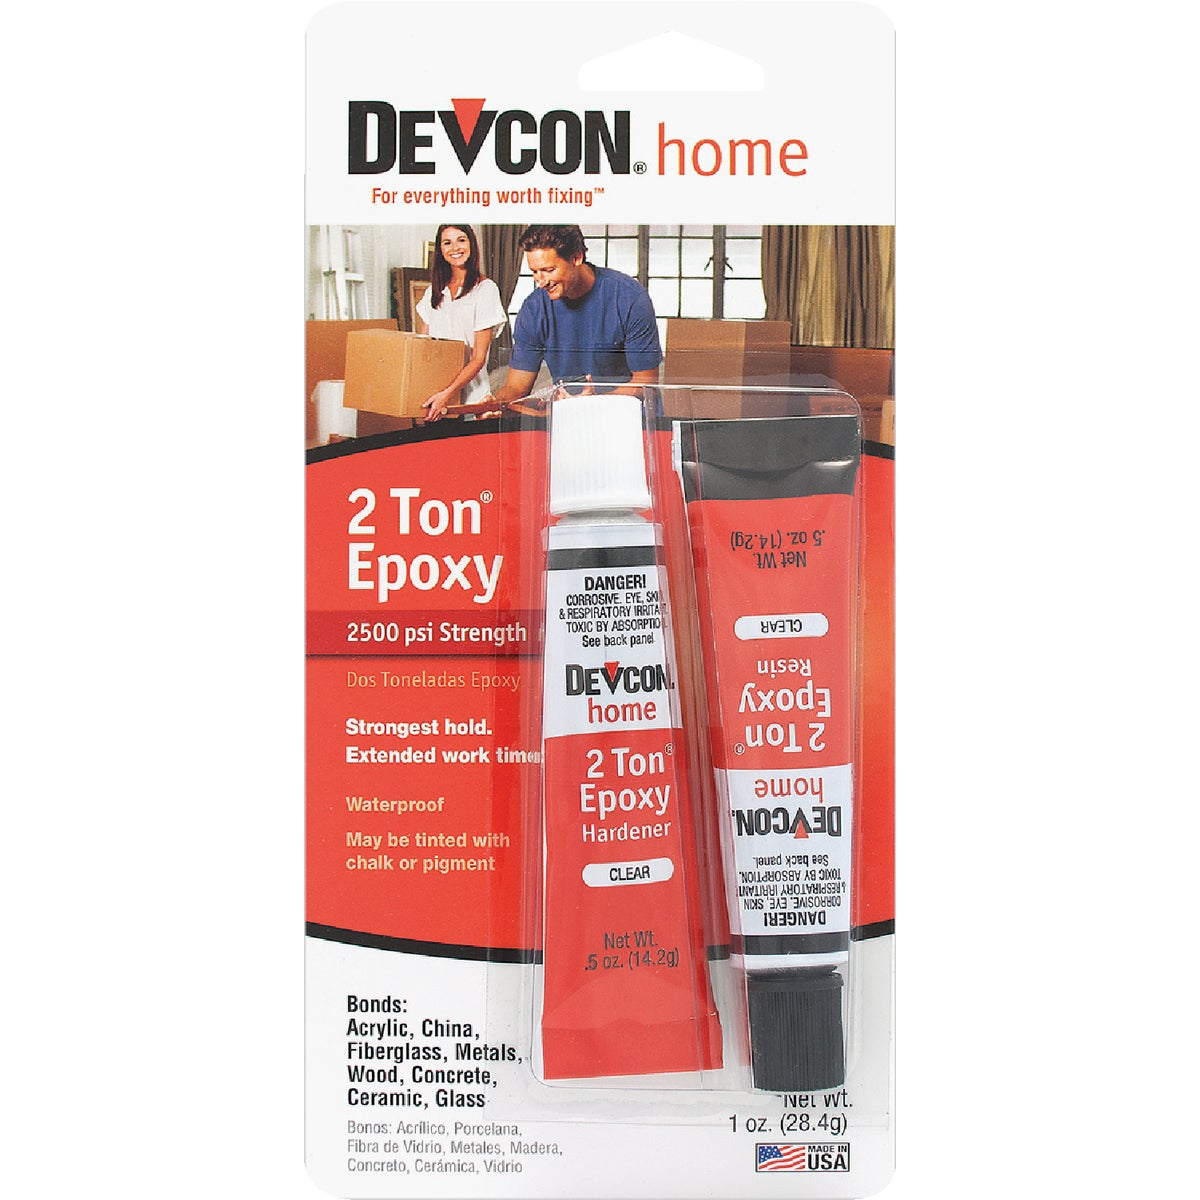 ITW Consumer/ Devcon 1OZ CLR 2-TON EPOXY S-35